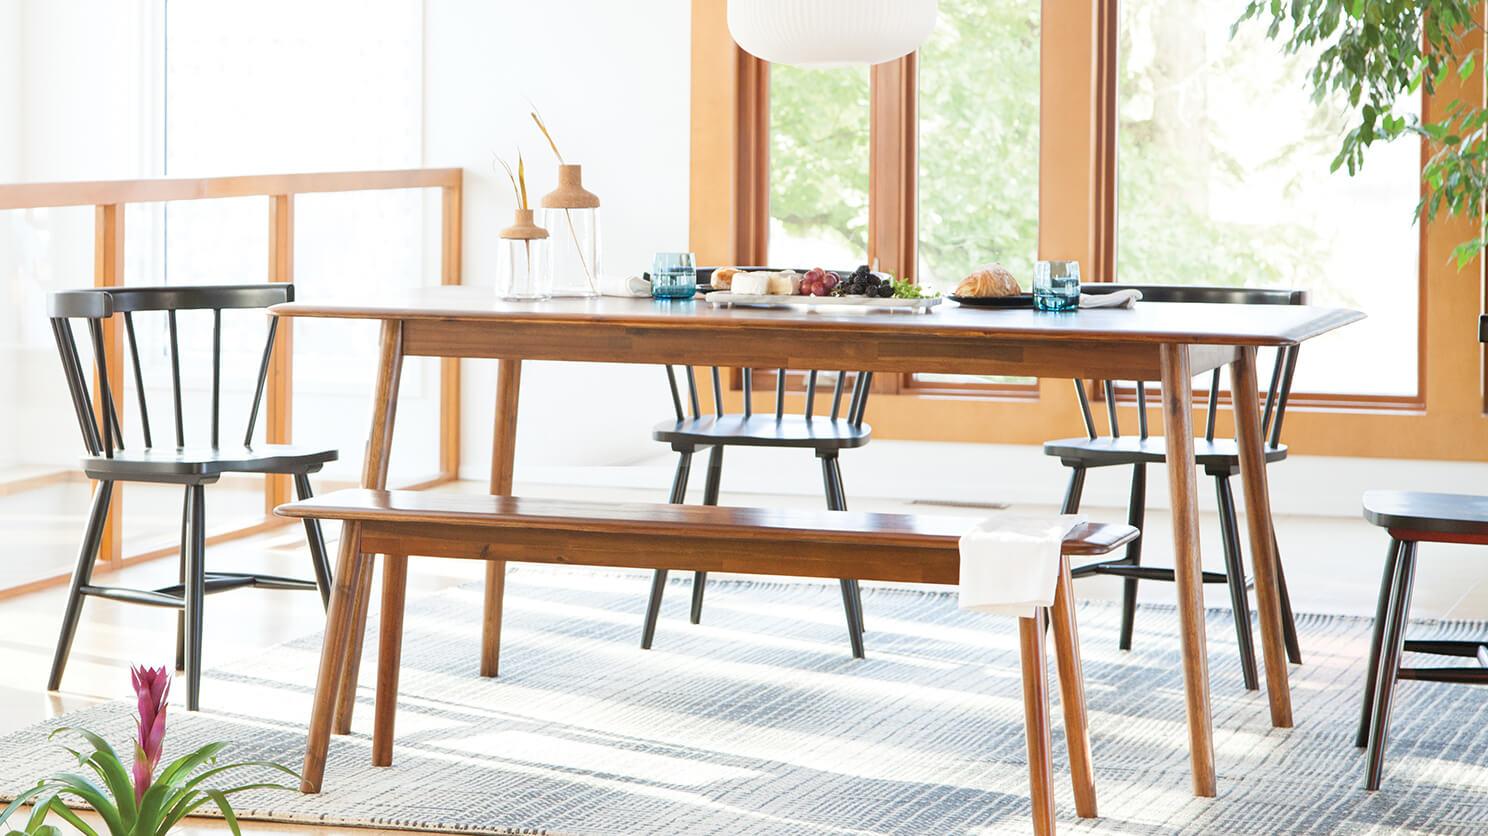 Kacia Bench Modern Boho Dining Table, Eq3 Dining Room Tables